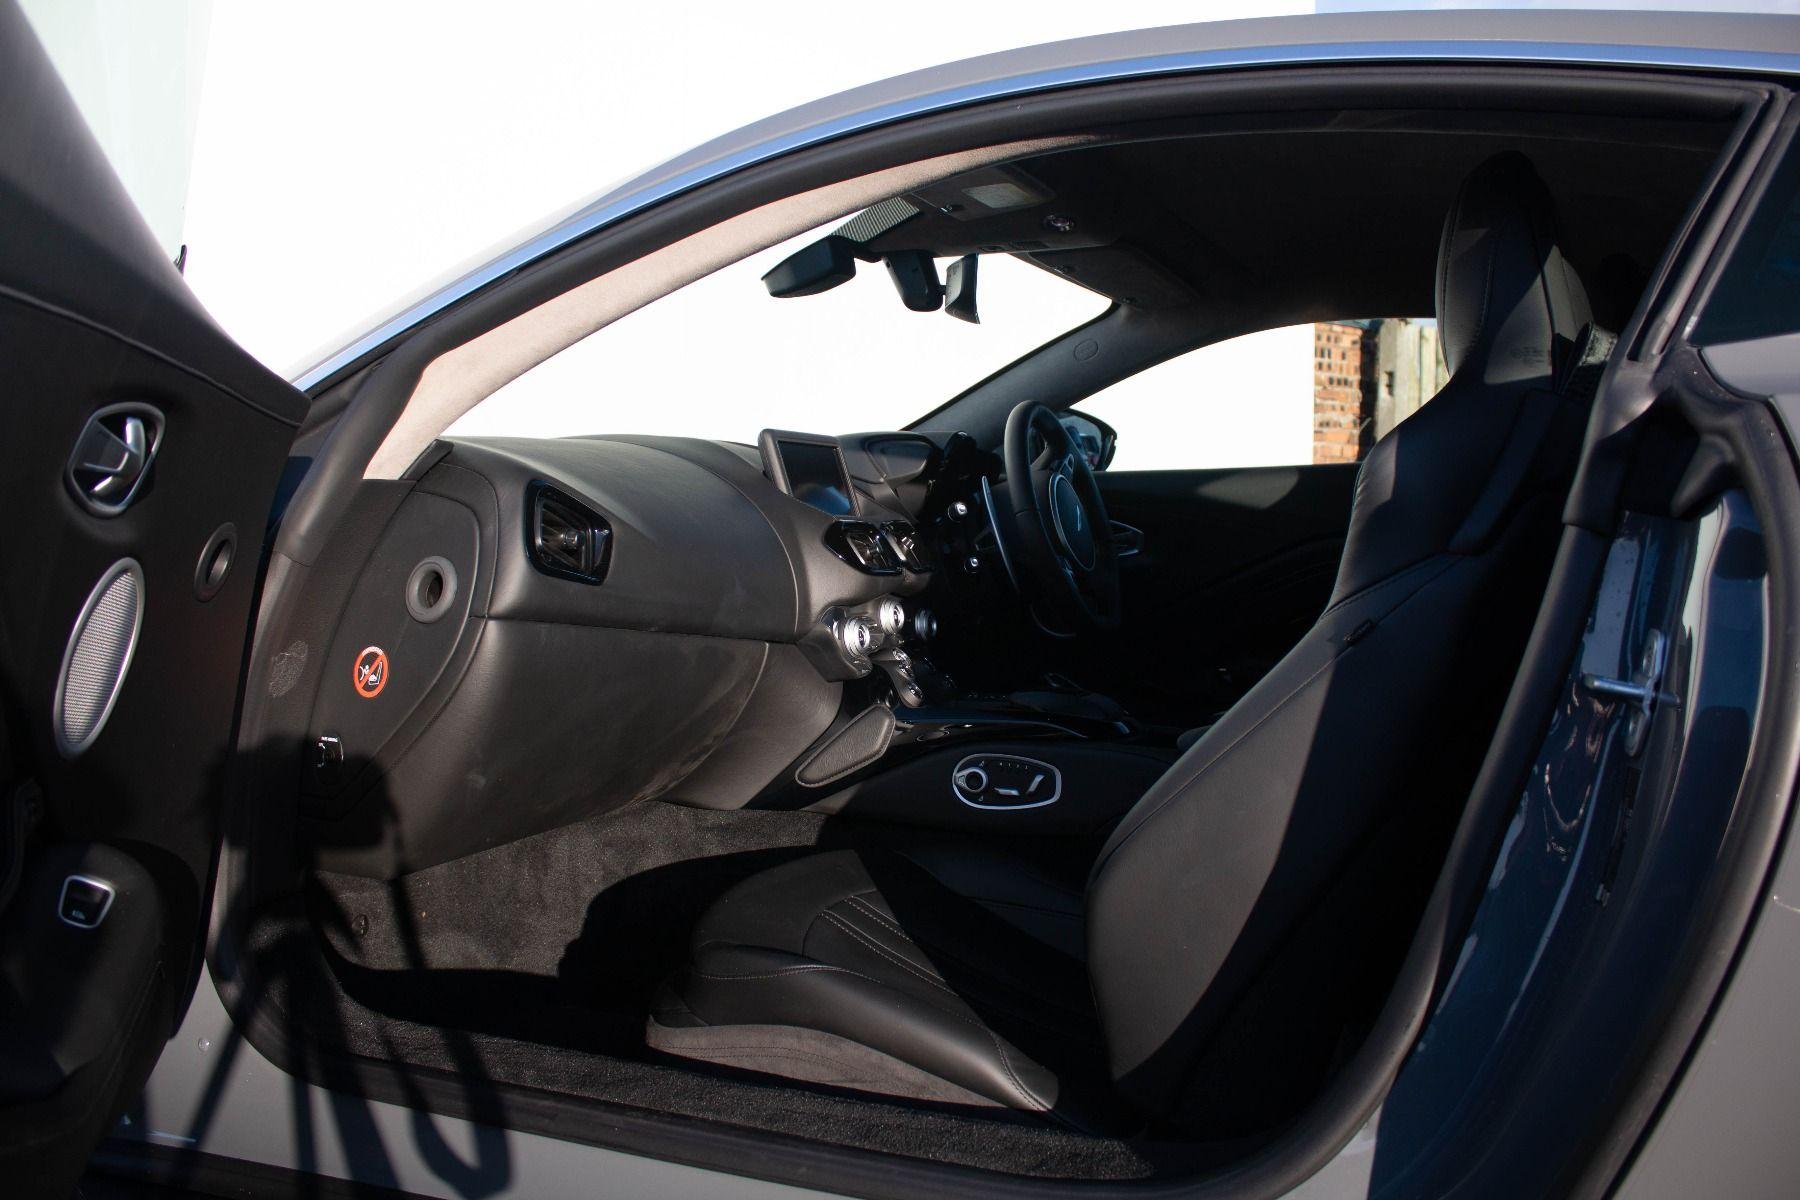 Aston Martin V8 Vantage Coupe 2dr ZF 8 Speed image 13